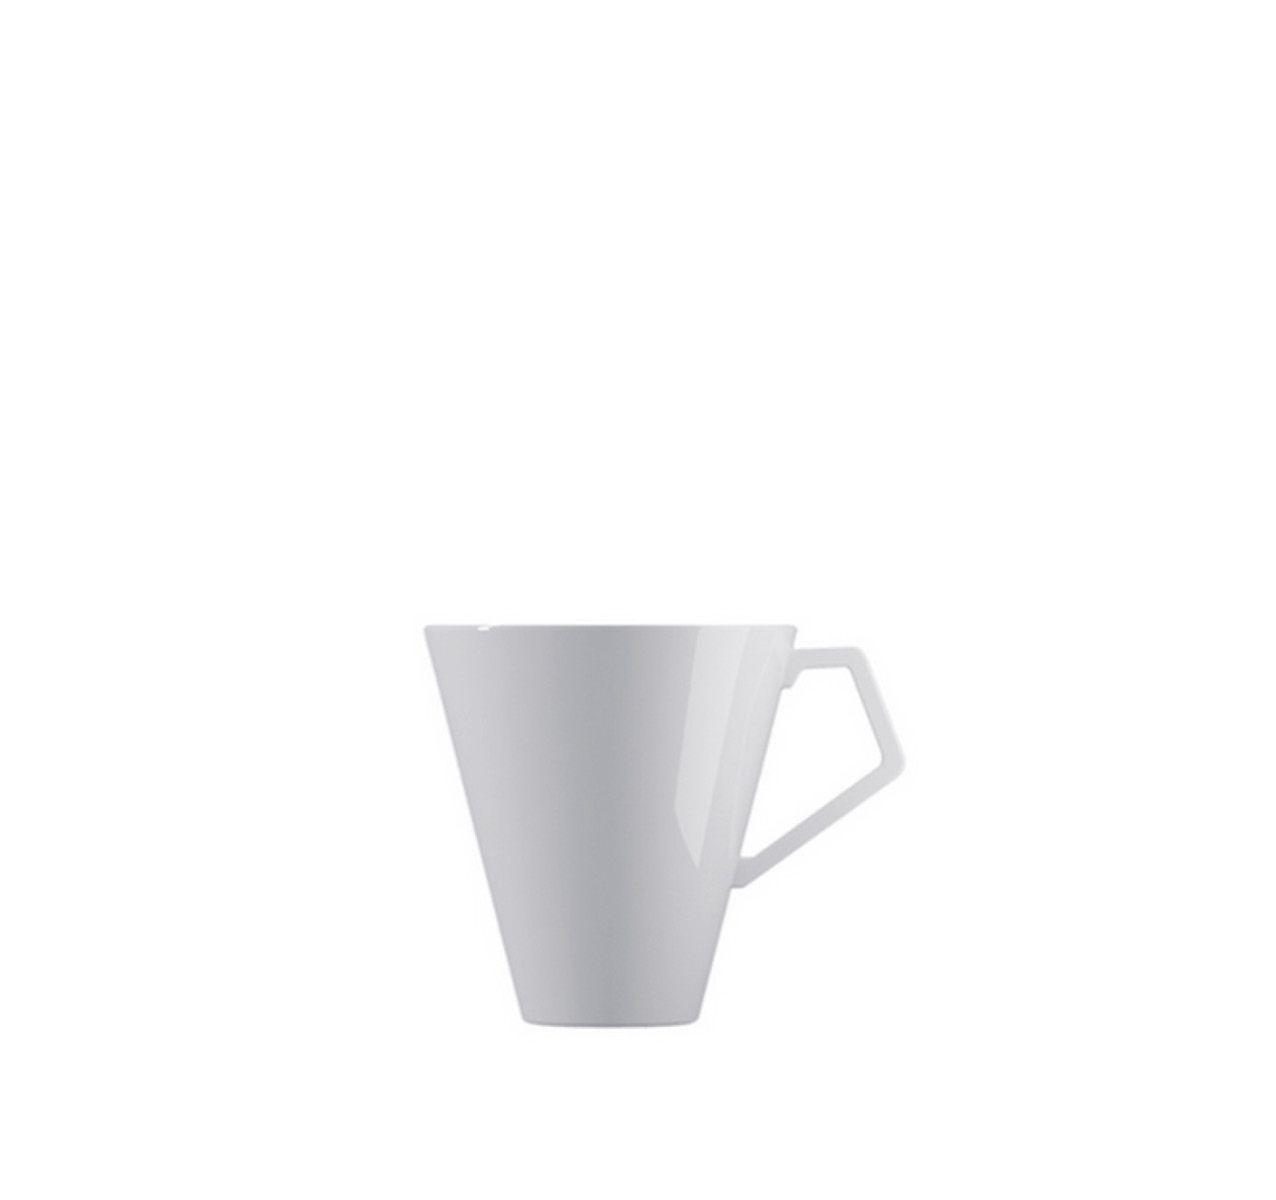 Anatolia - Coffee Cup Set of 6 Porcelain